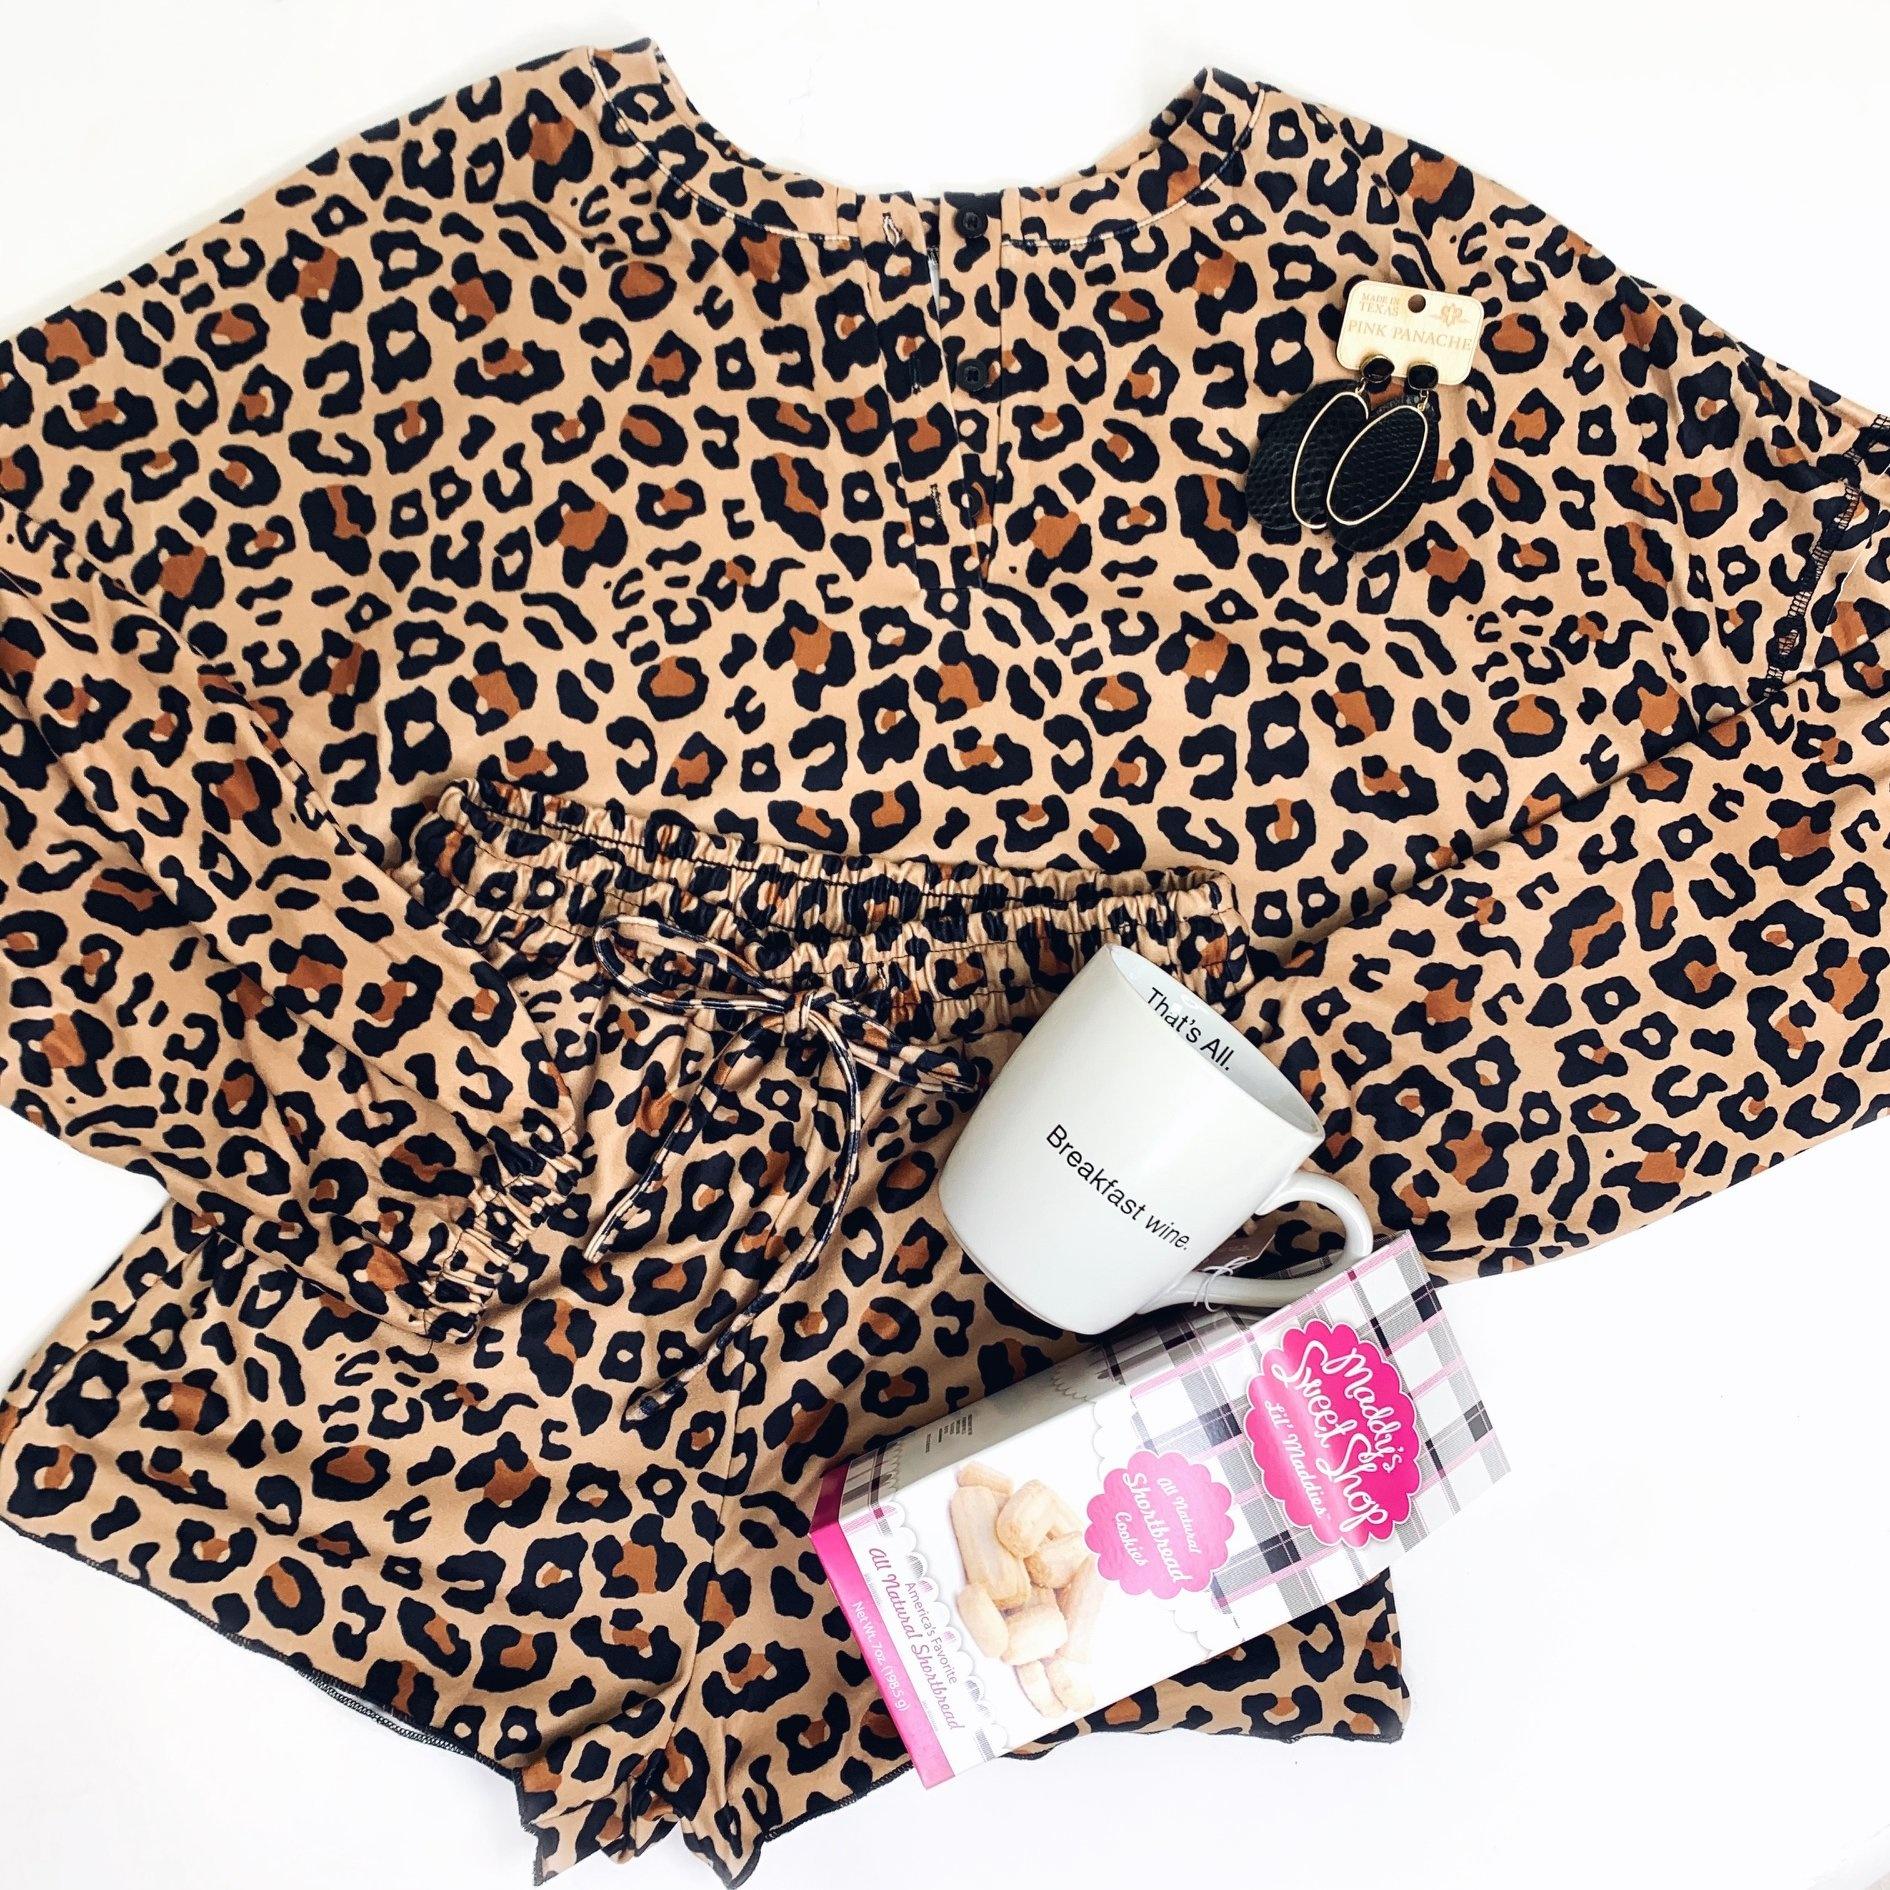 Leopard Tie Die Knit Pj 2 Piece Set